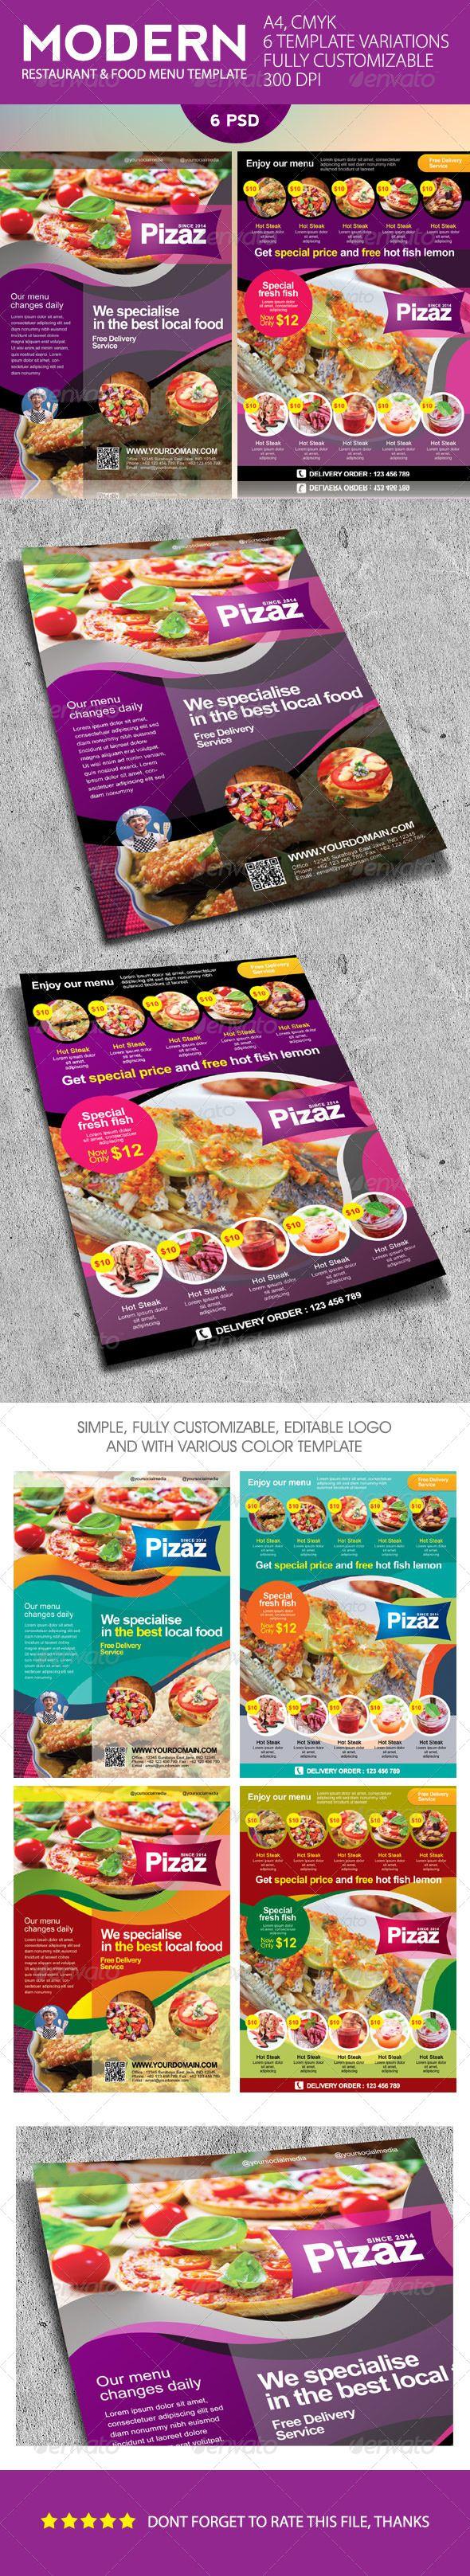 Modern Restaurant and Food Menu Flyer Template #design #speisekarte Download: http://graphicriver.net/item/modern-restaurant-and-food-menu-flyer/7489990?ref=ksioks